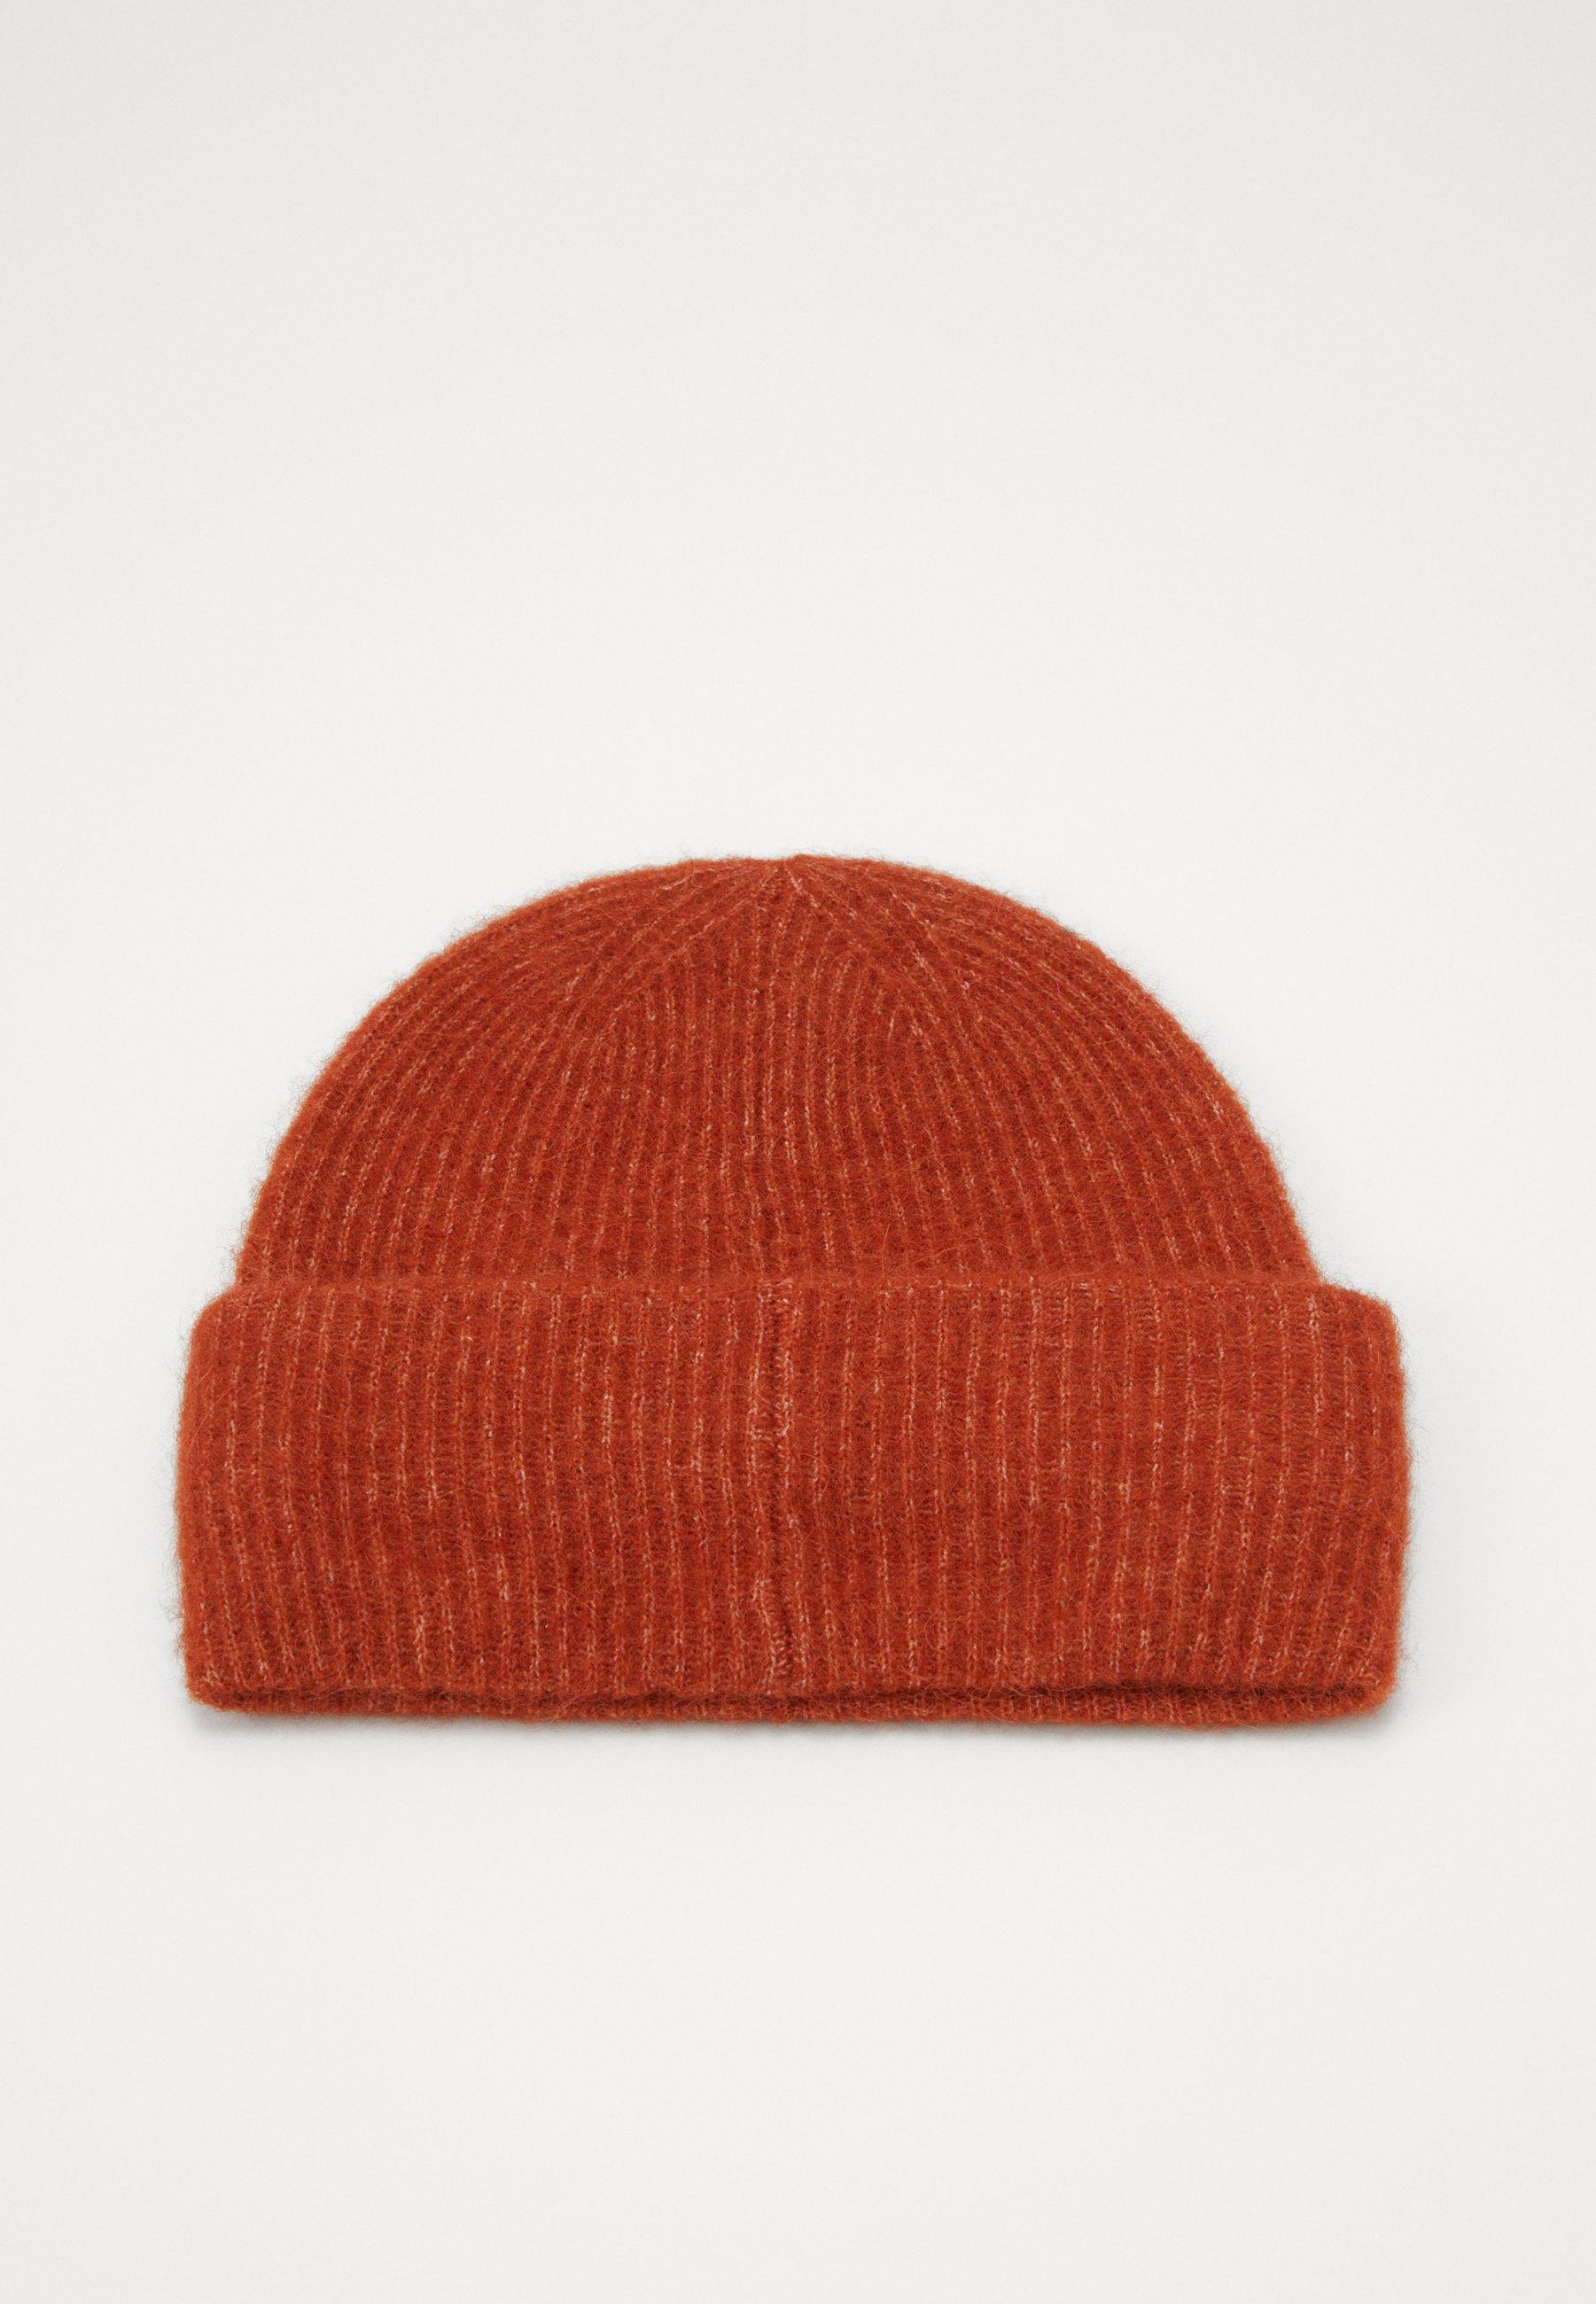 Samsøe Samsøe NOR HAT - Lue - picante/brun 0iC5hrr8pFsKOJJ